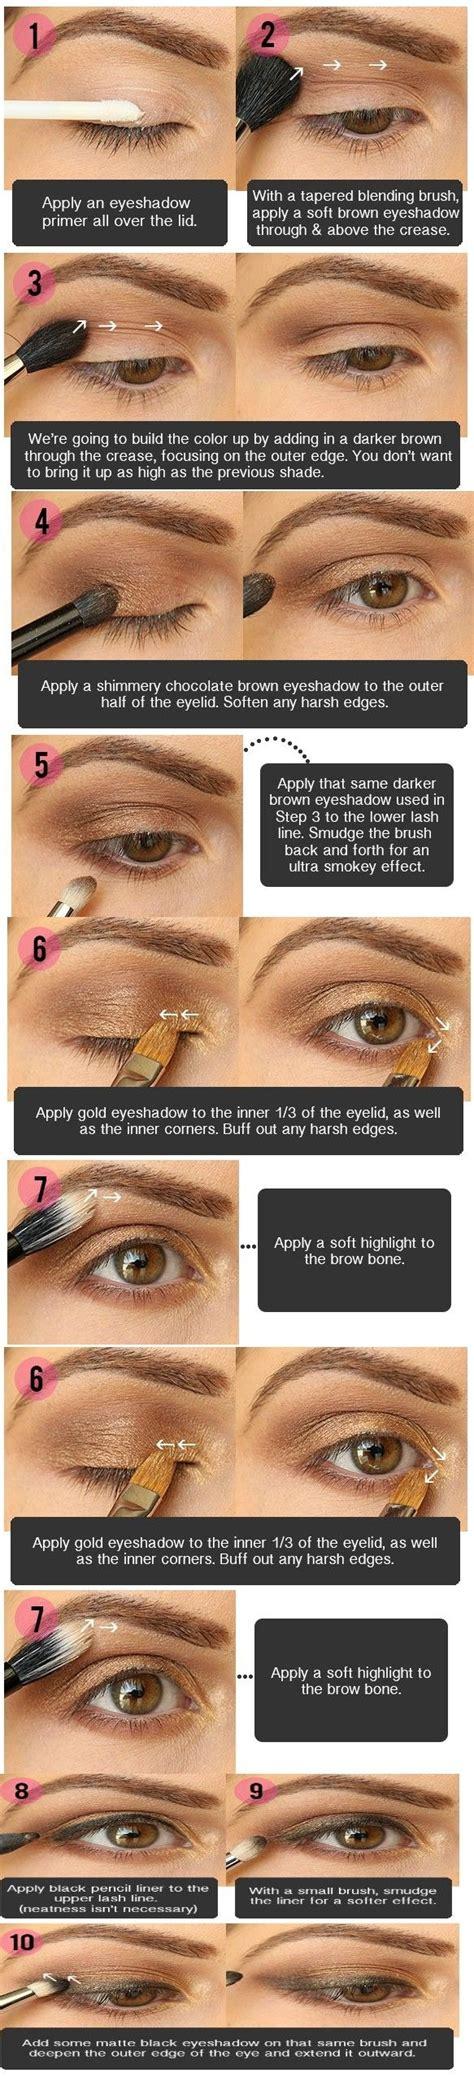 10 Brown Smokey Eye Tips by 10 Tips Smokey Eye Makeup For Brown